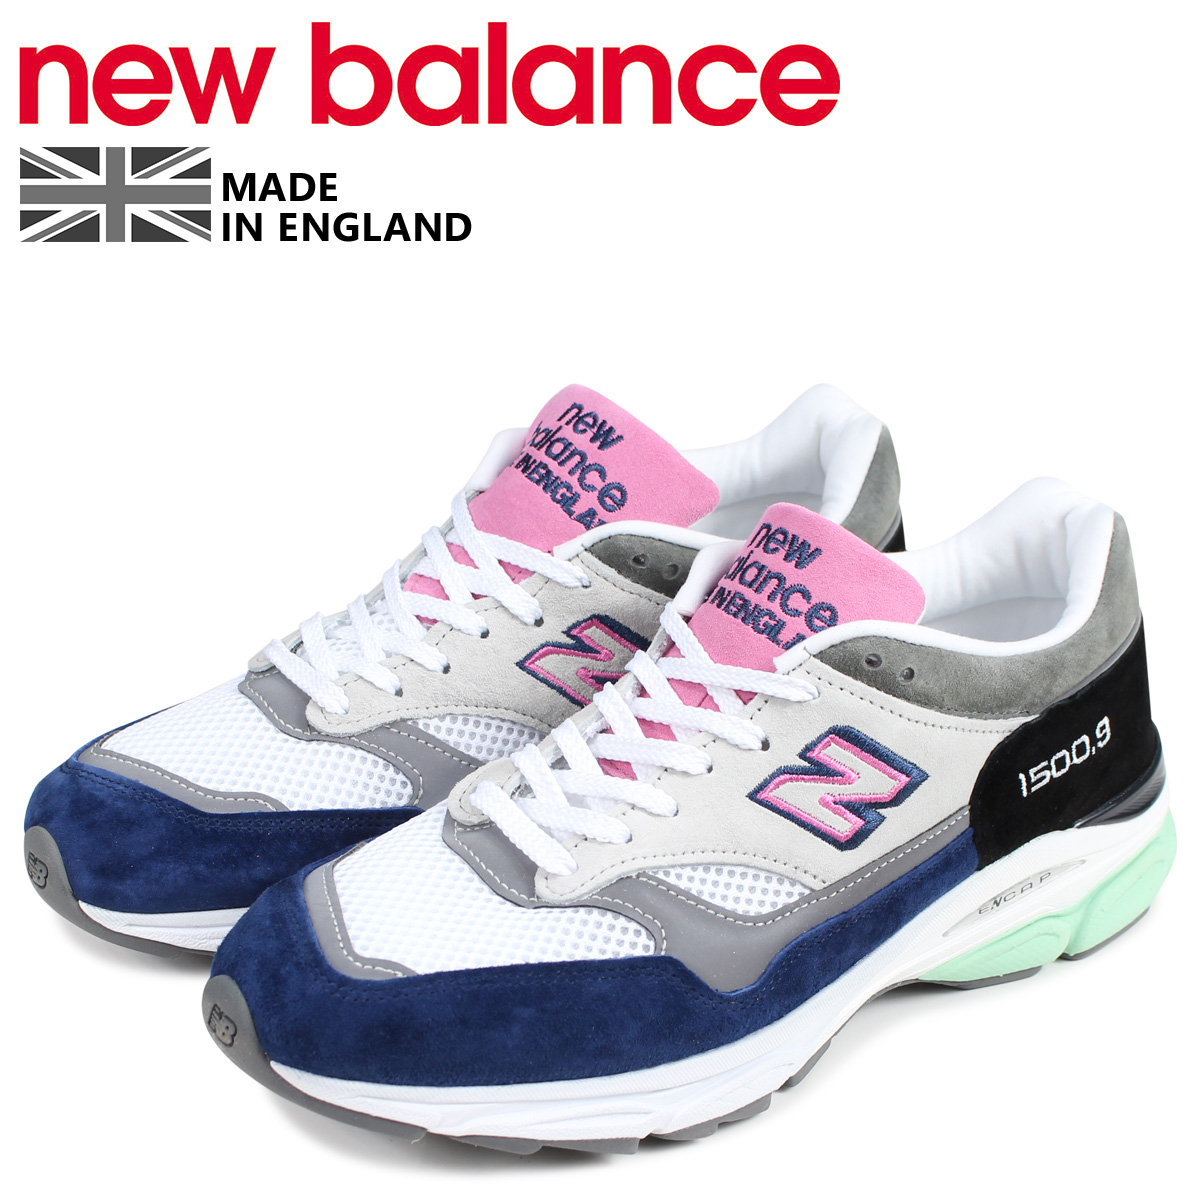 new balance 1500.9